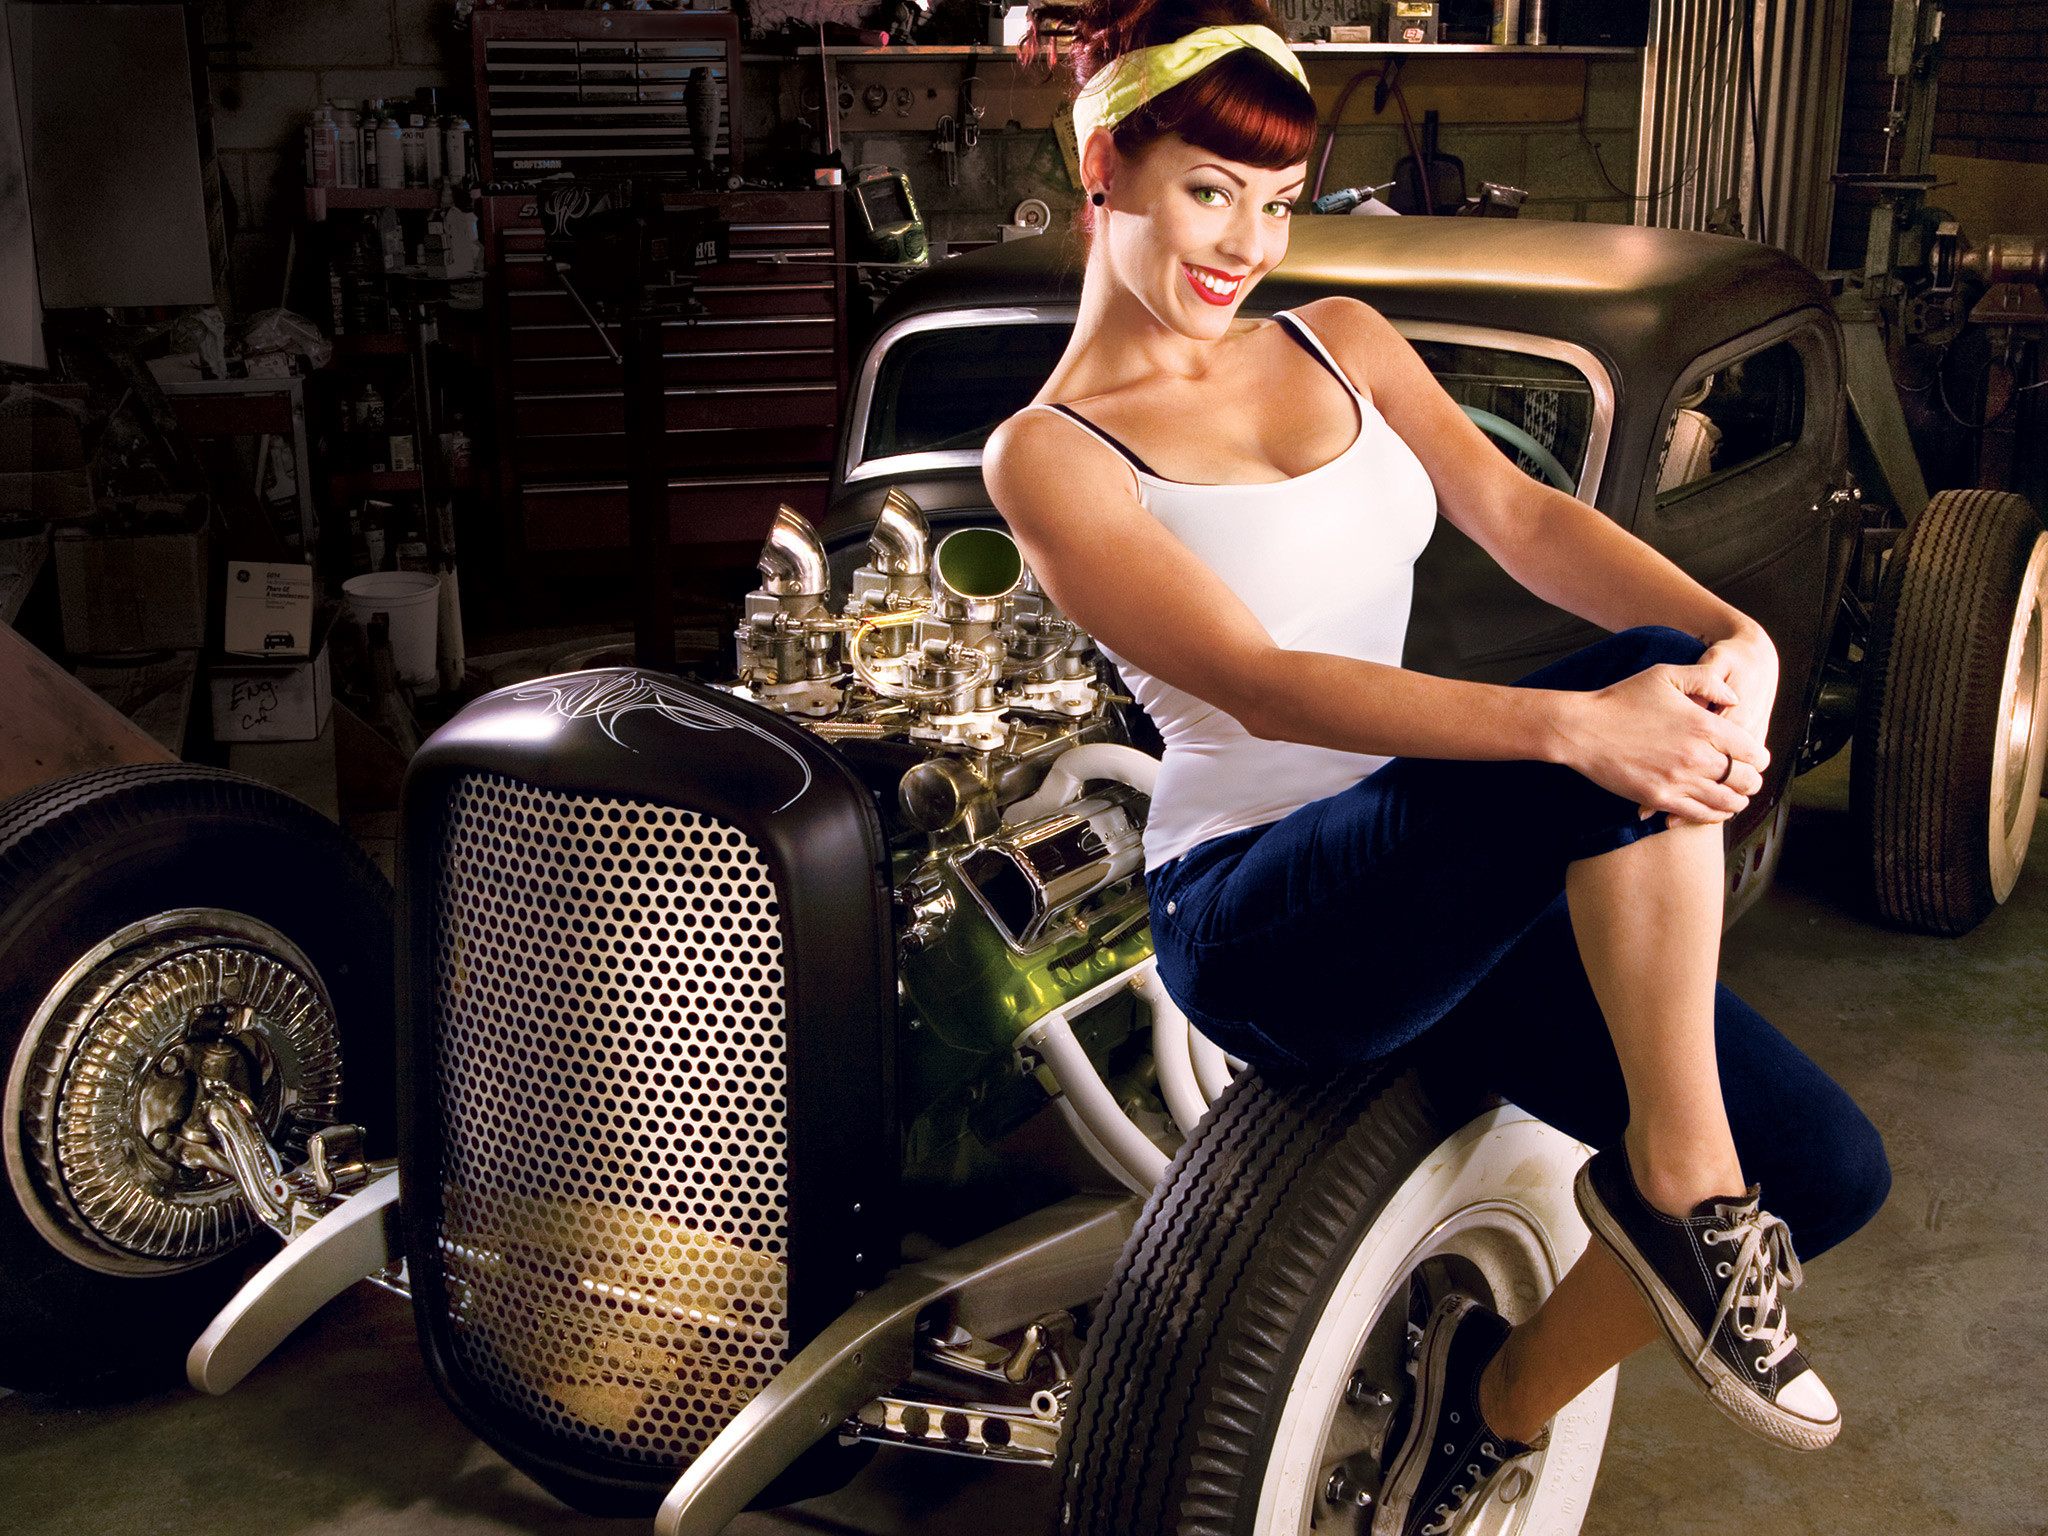 Res: 2048x1536, Rockabilly Girls HD Widescreen Wallpapers - DBB-HD Pics